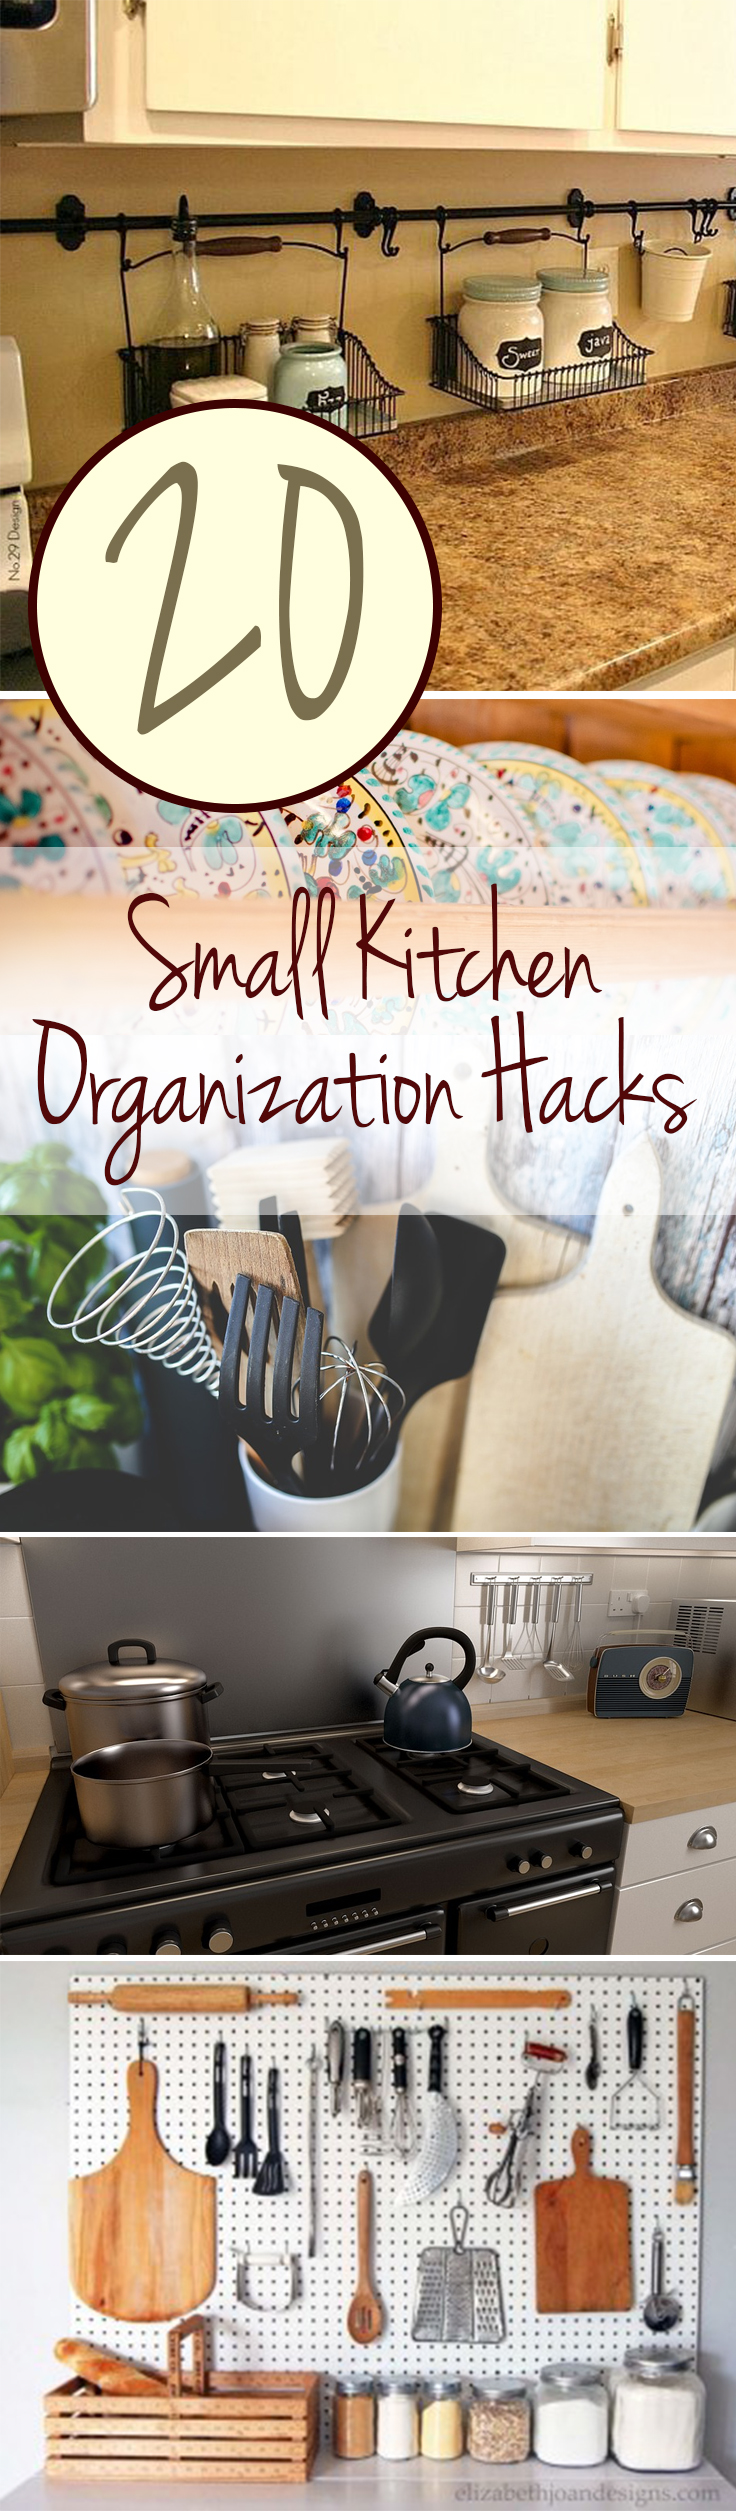 20-small-kitchen-organization-hacks-1